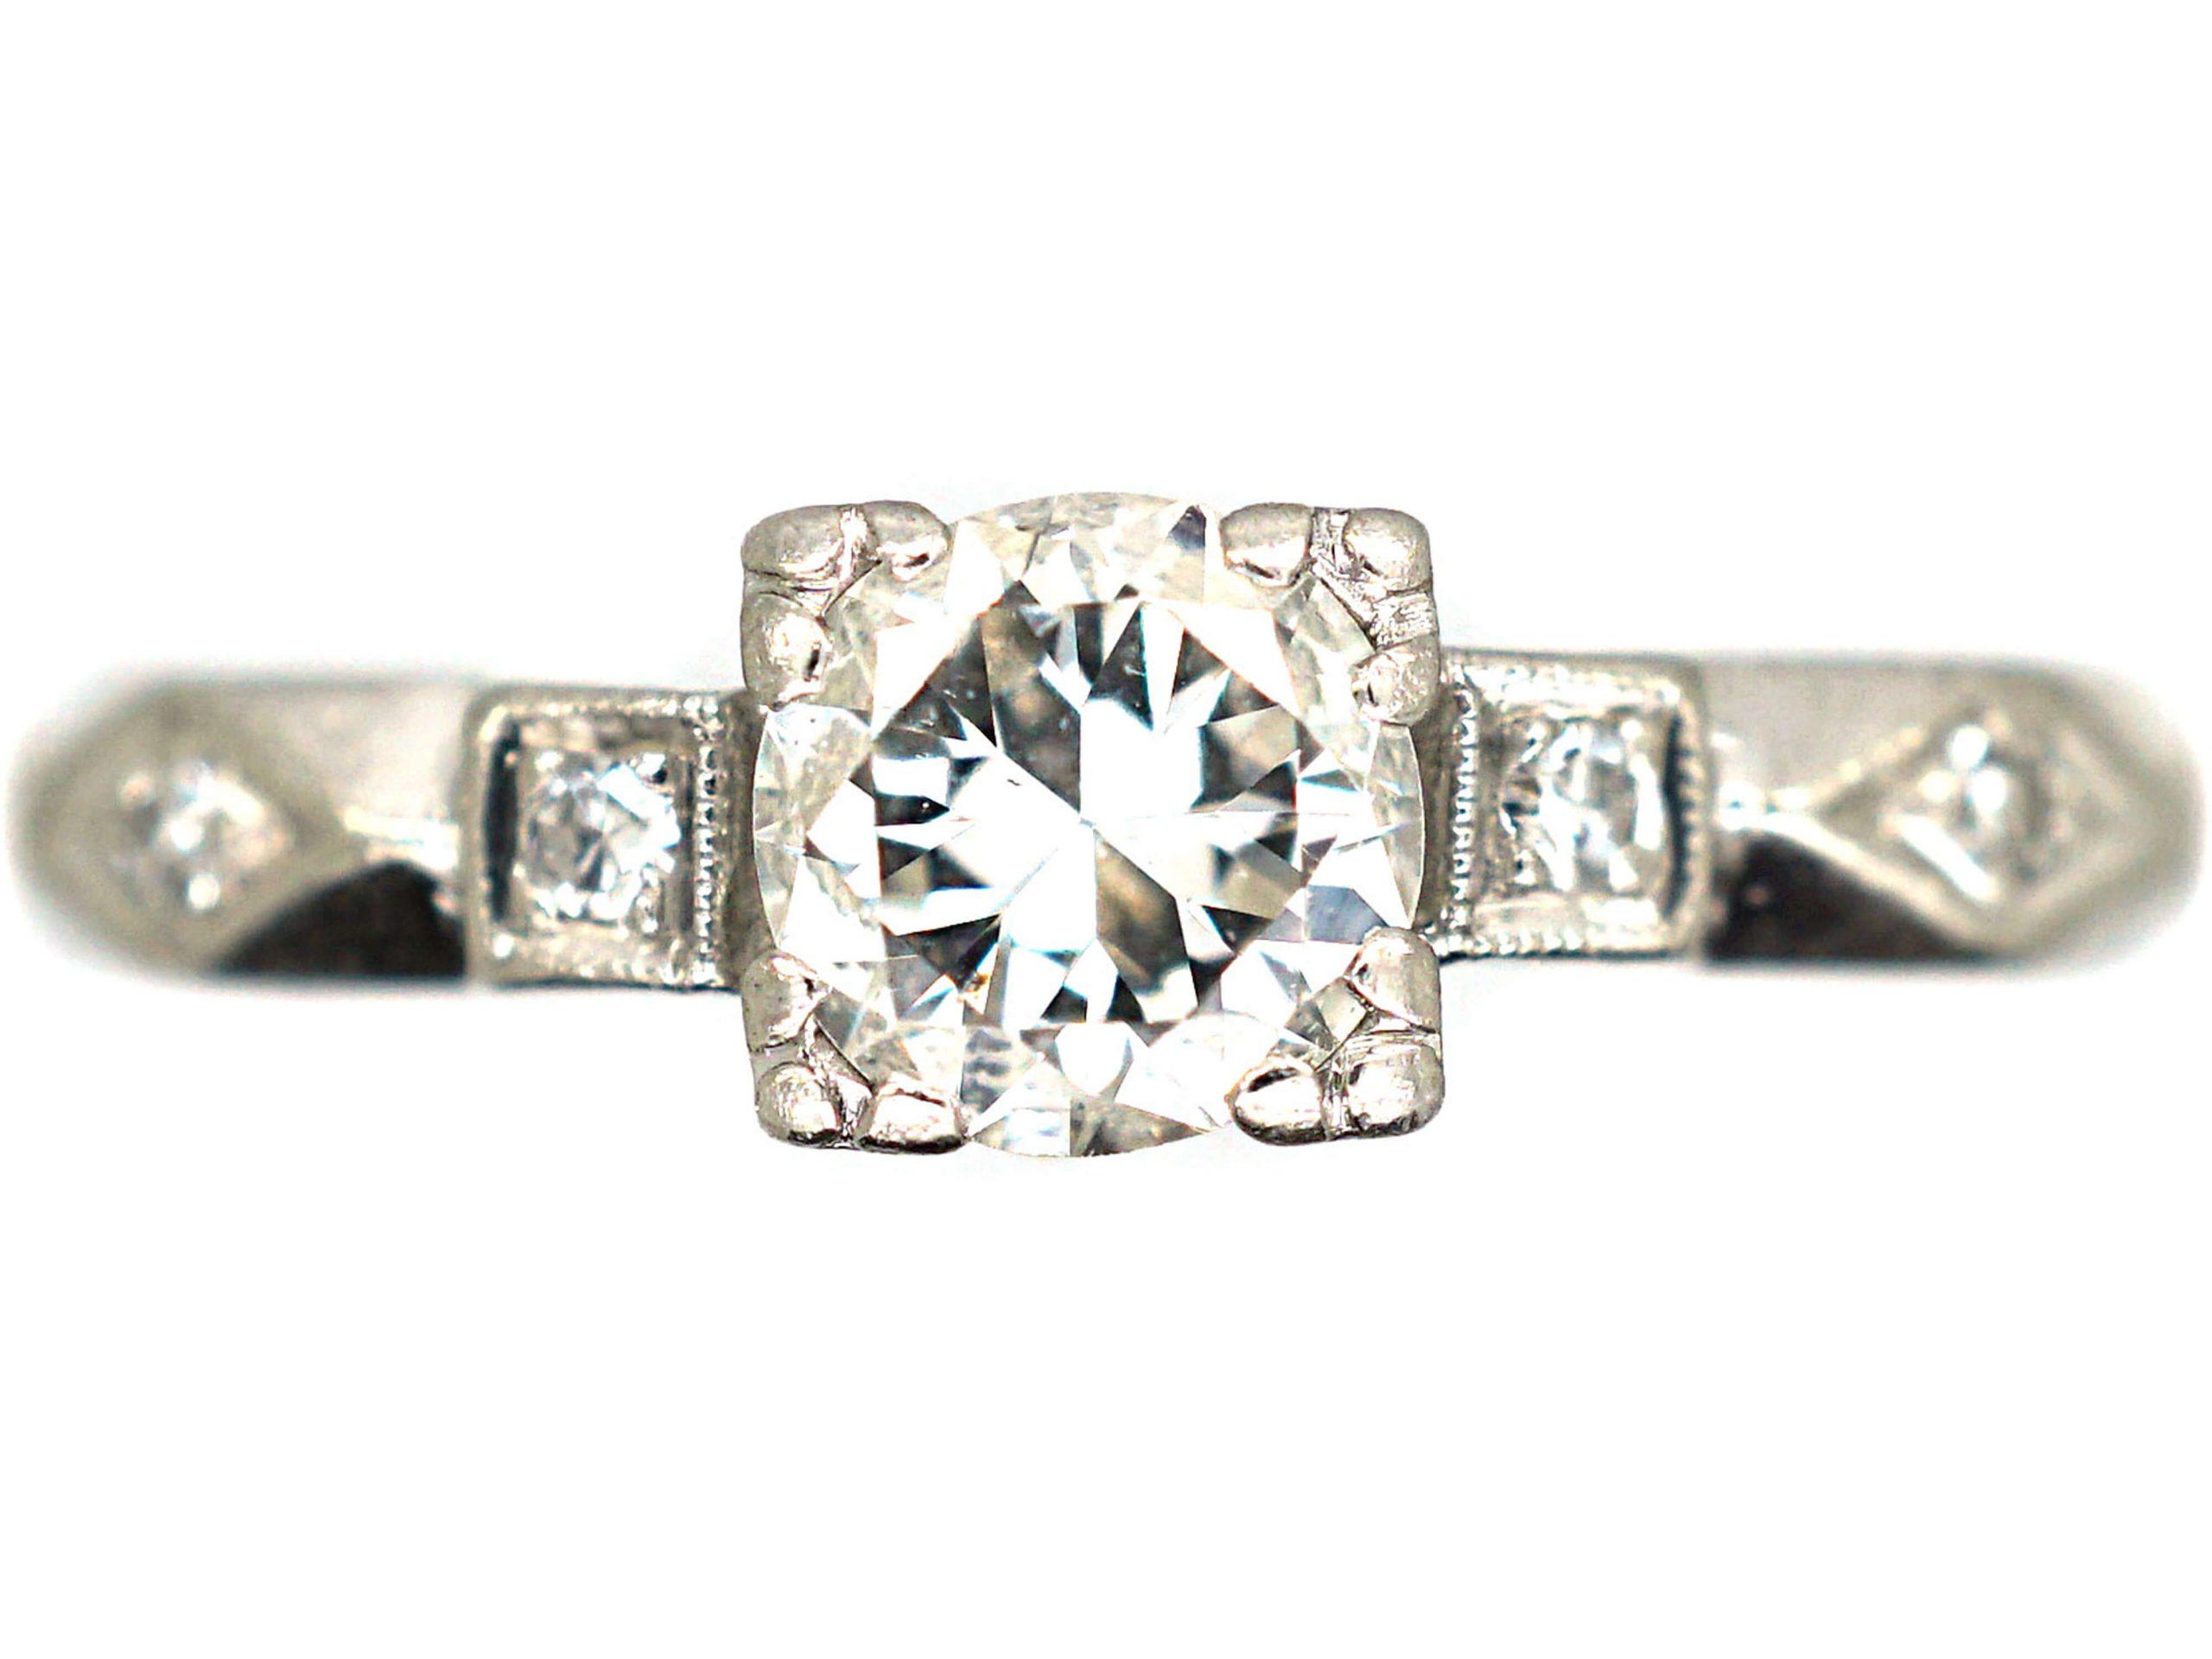 Art Deco Platinum & Diamond Solitaire Ring with Geometric Diamond Set Shoulders